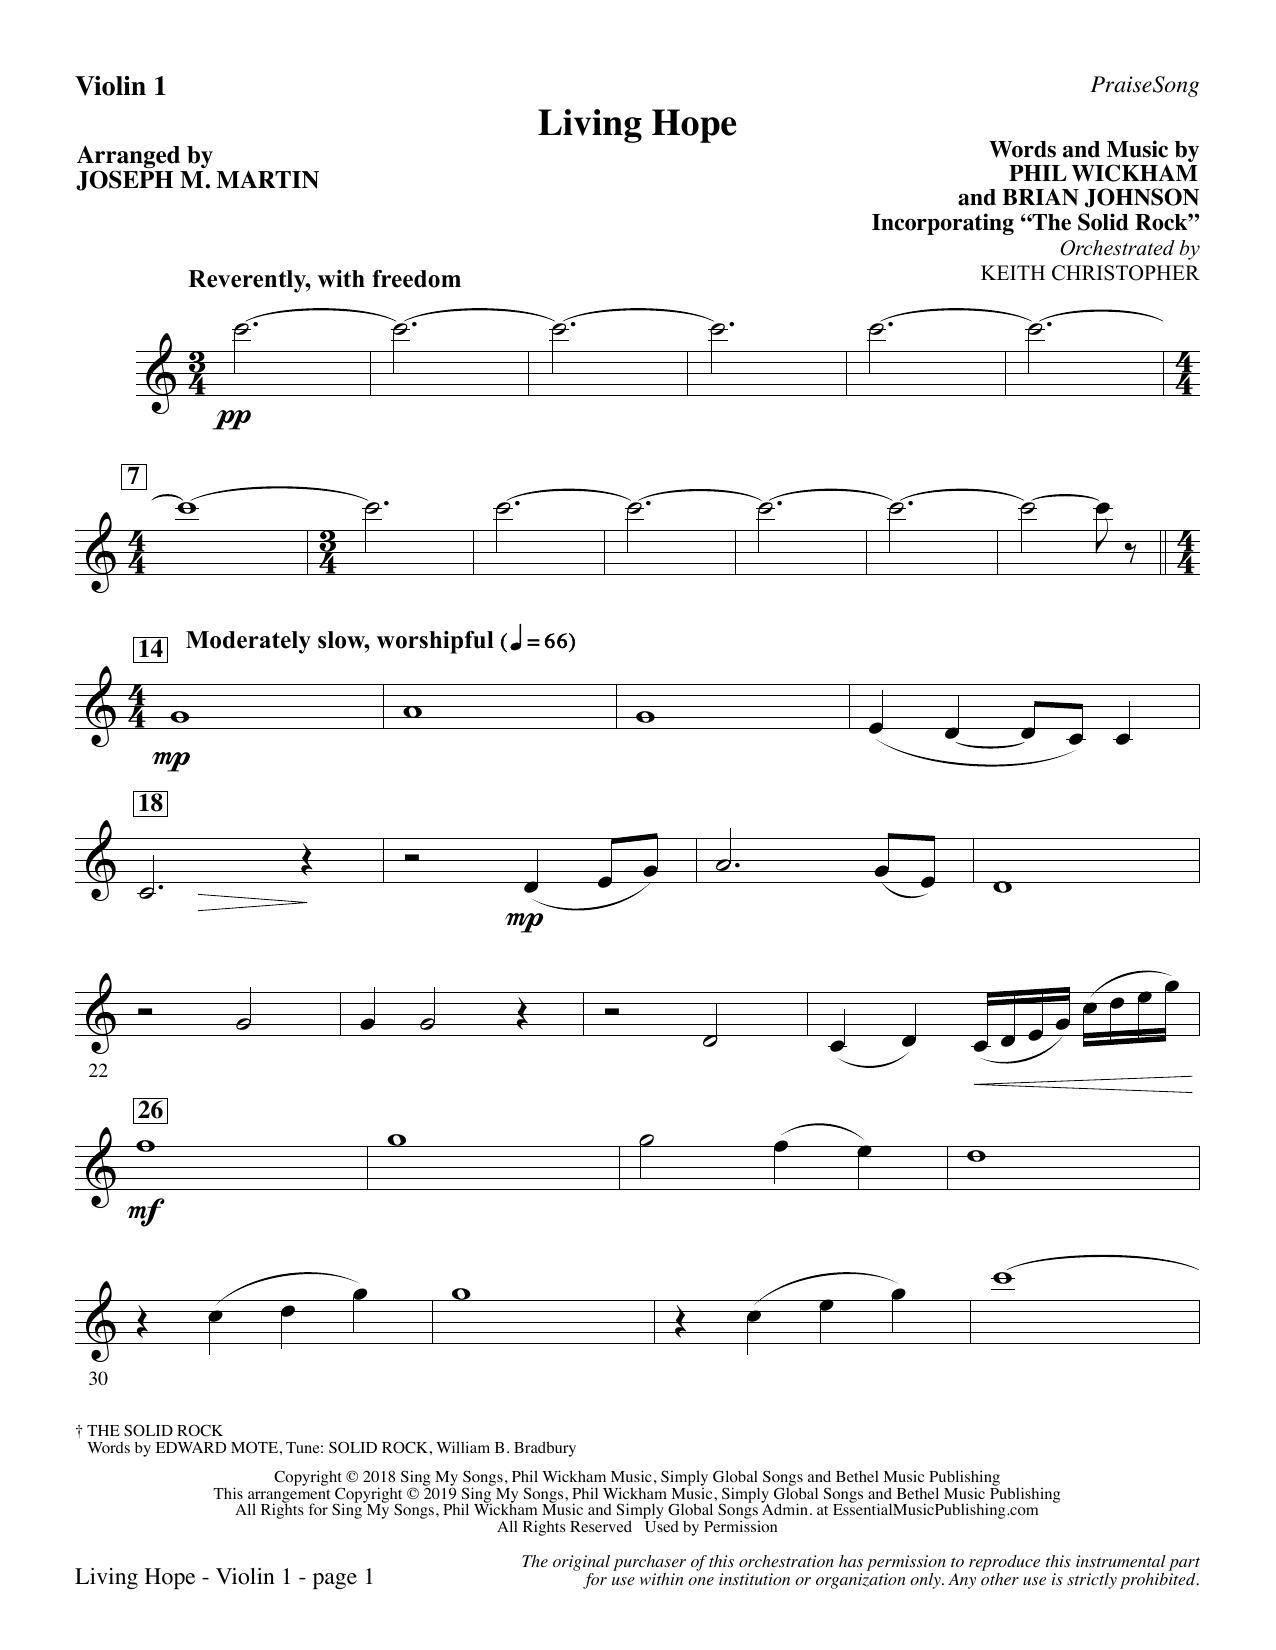 Living Hope (arr. Joseph M. Martin) - Violin 1 Sheet Music